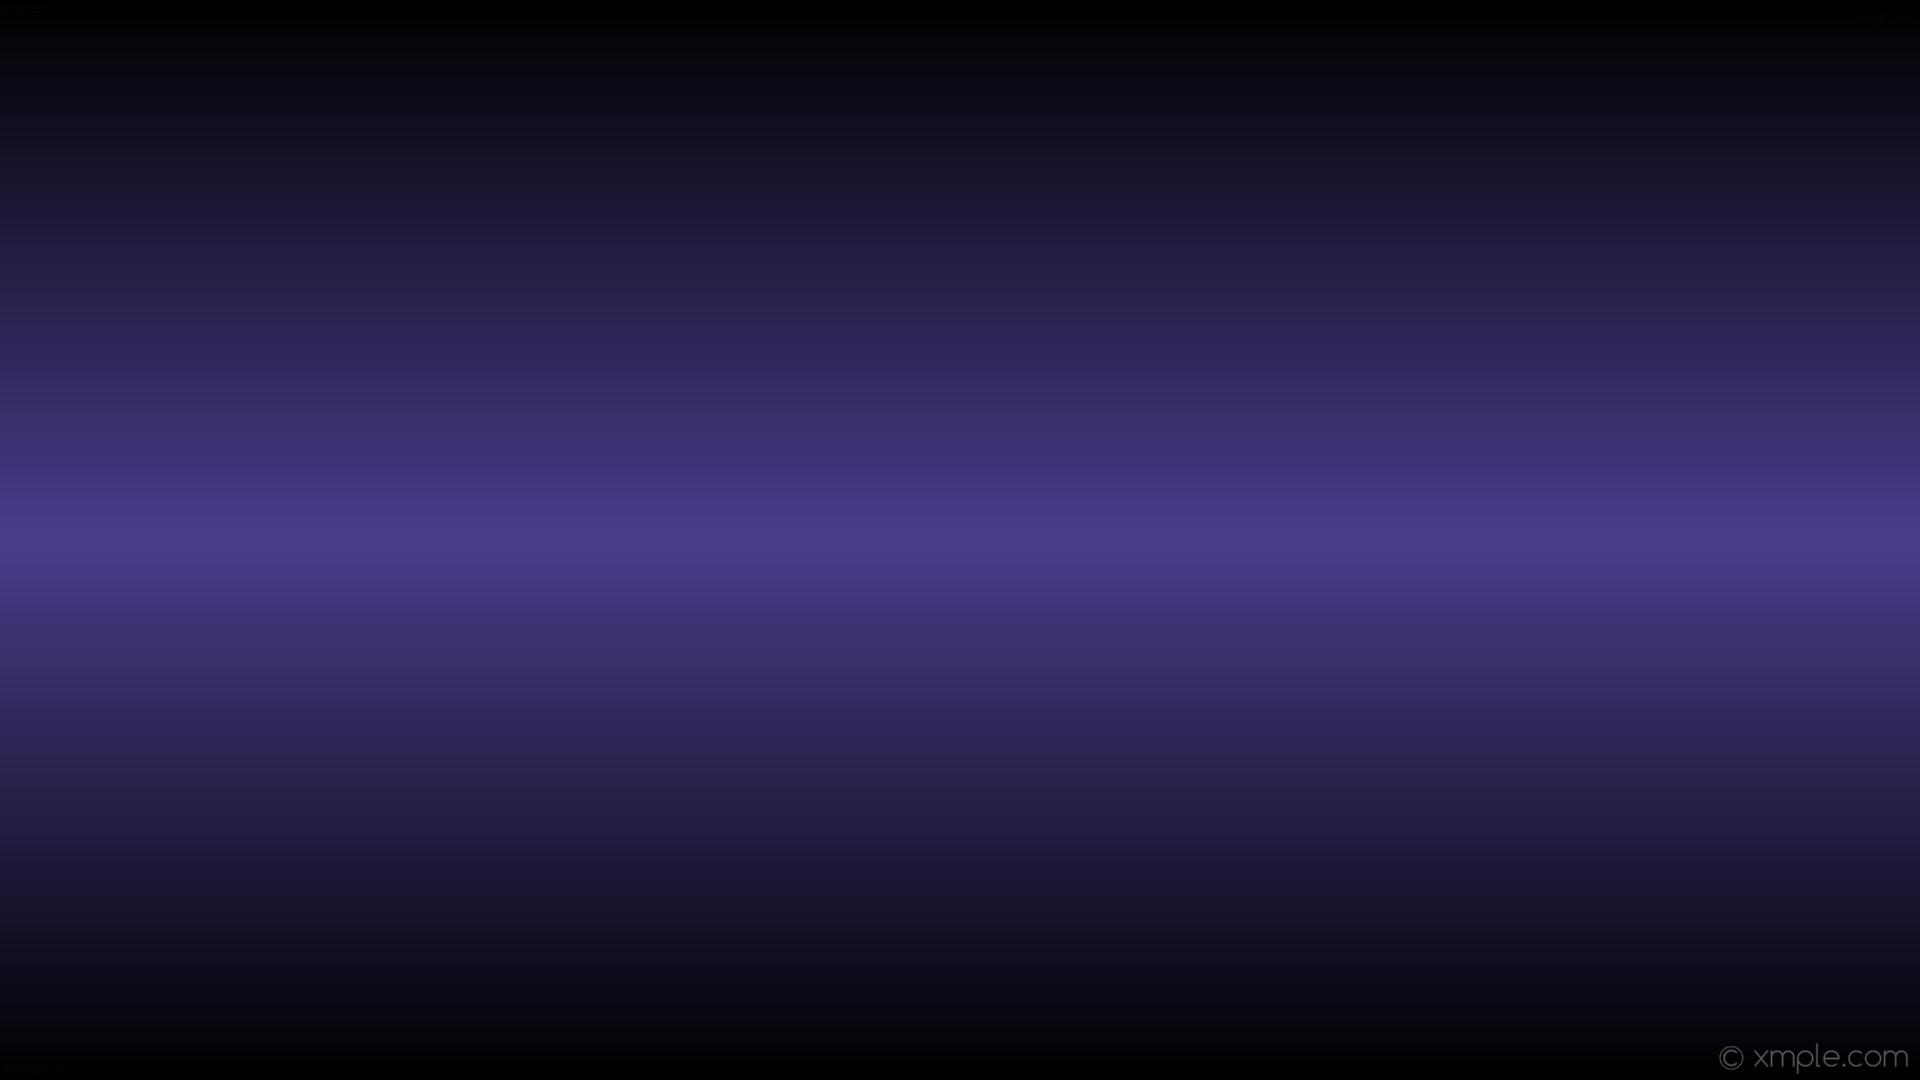 wallpaper linear purple black gradient highlight dark slate blue #000000  #483d8b 270° 50